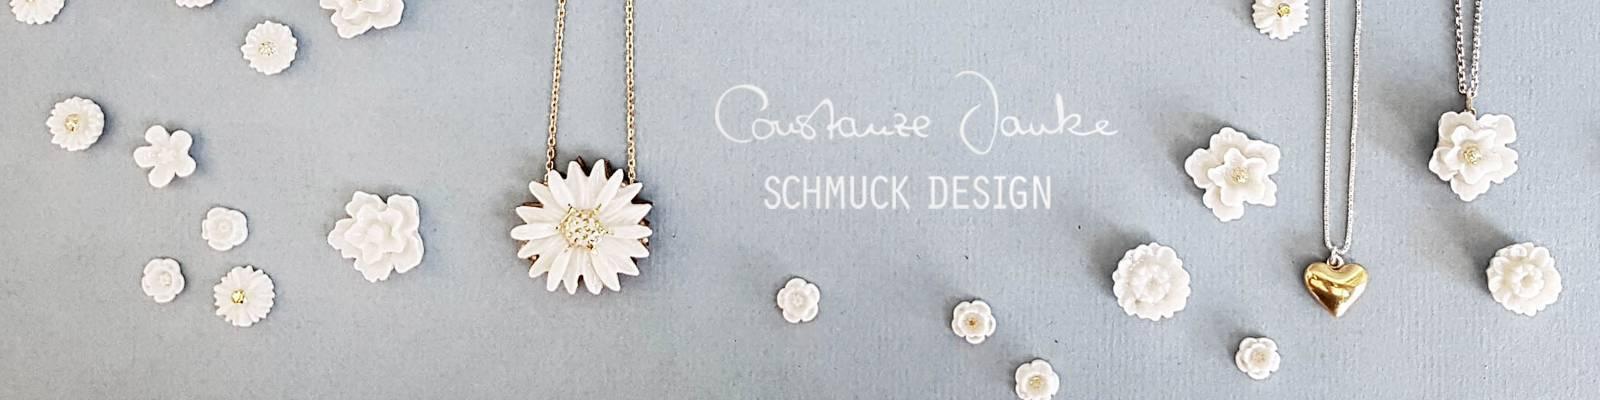 Constanze Janke Schmuckdesign